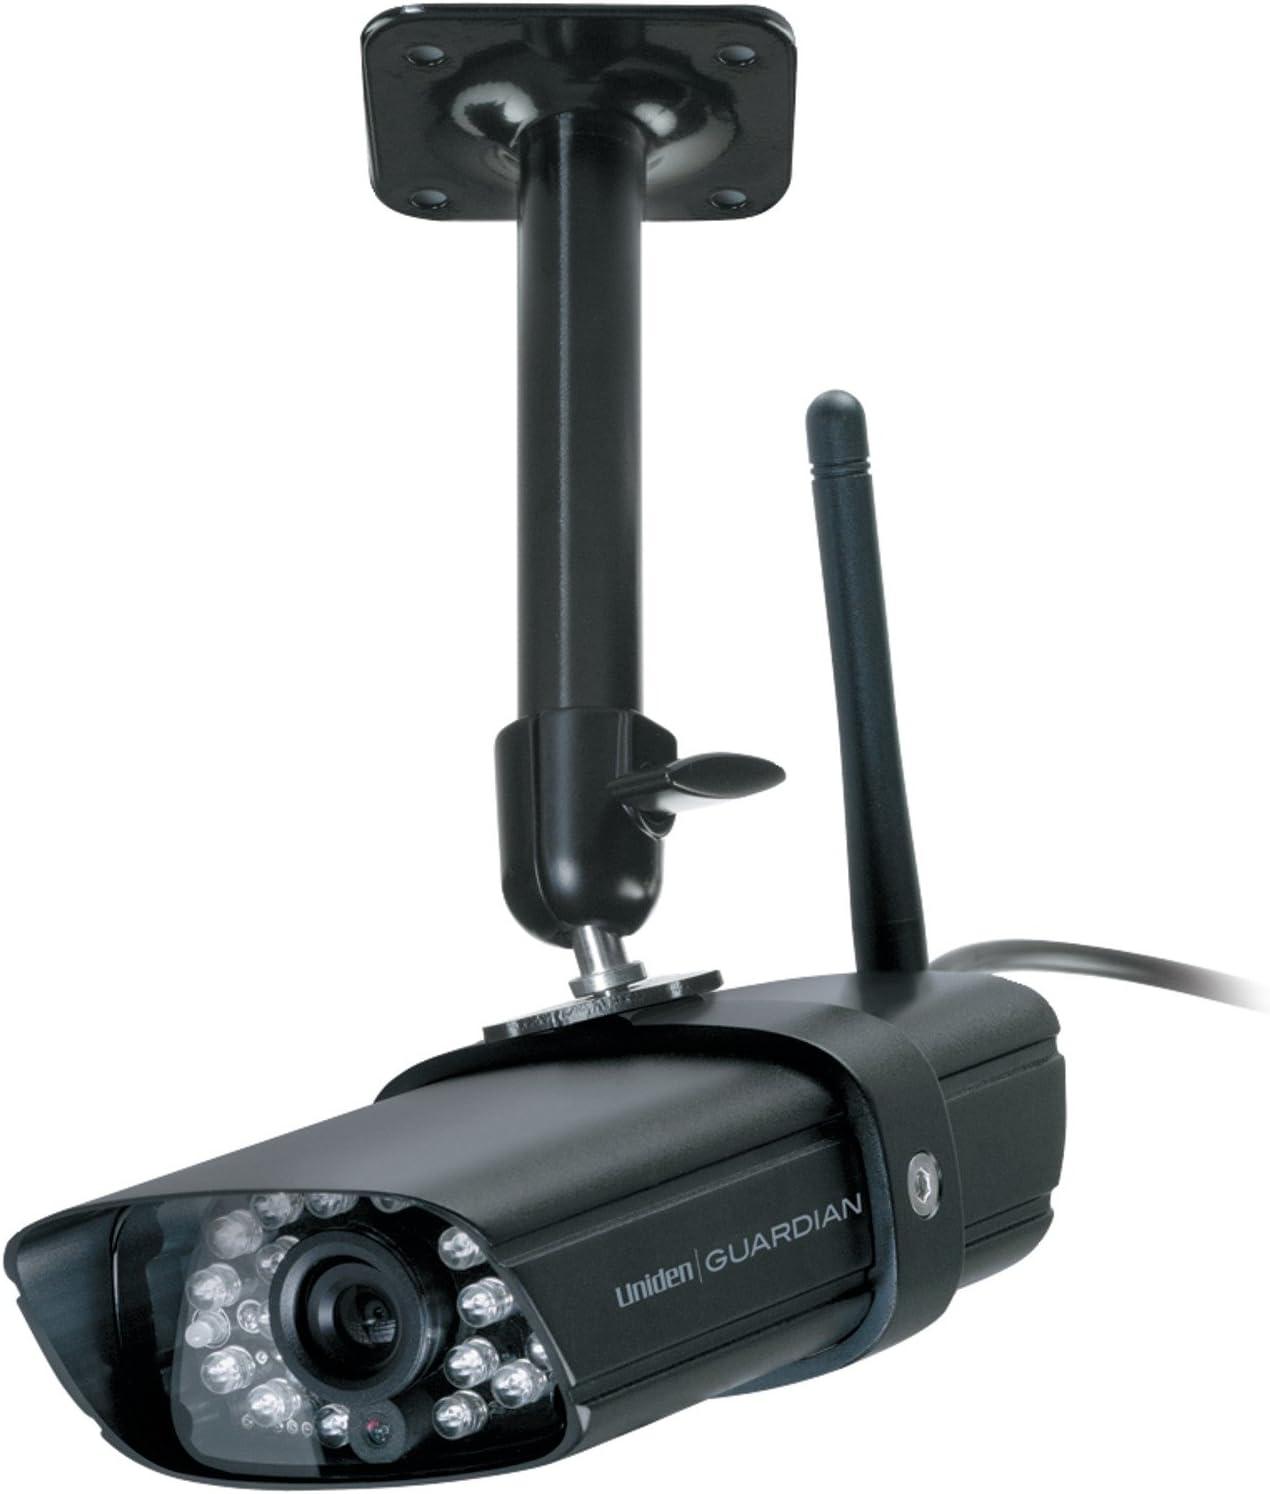 Black Uniden Wireless Weather Proof Video Surveillance Camera GC45